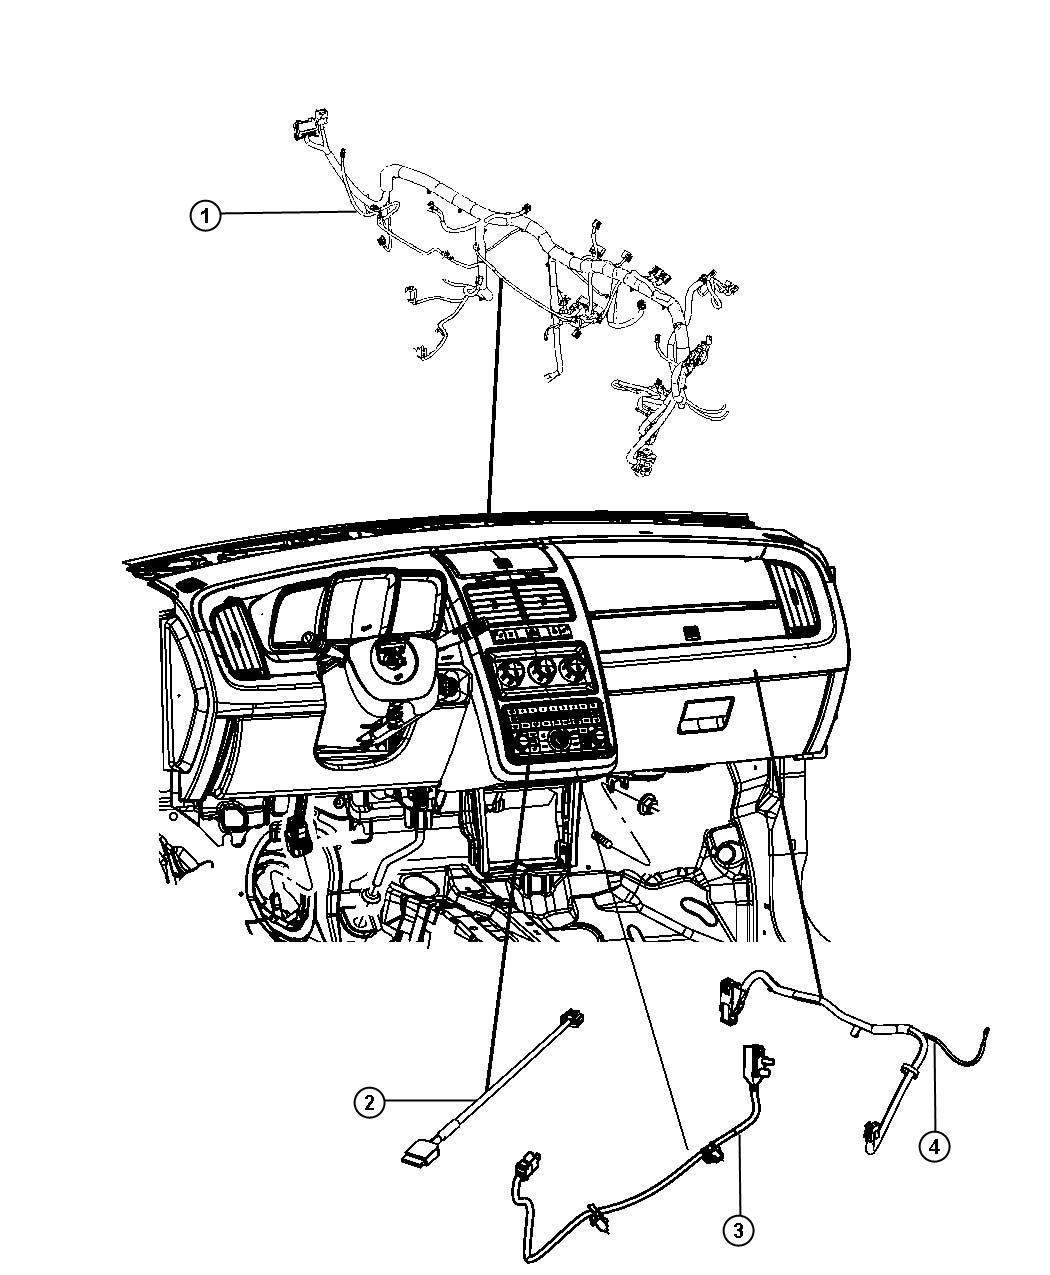 RAM C/V TRADESMAN Wiring. Jumper. Usb. Export, mexico, us